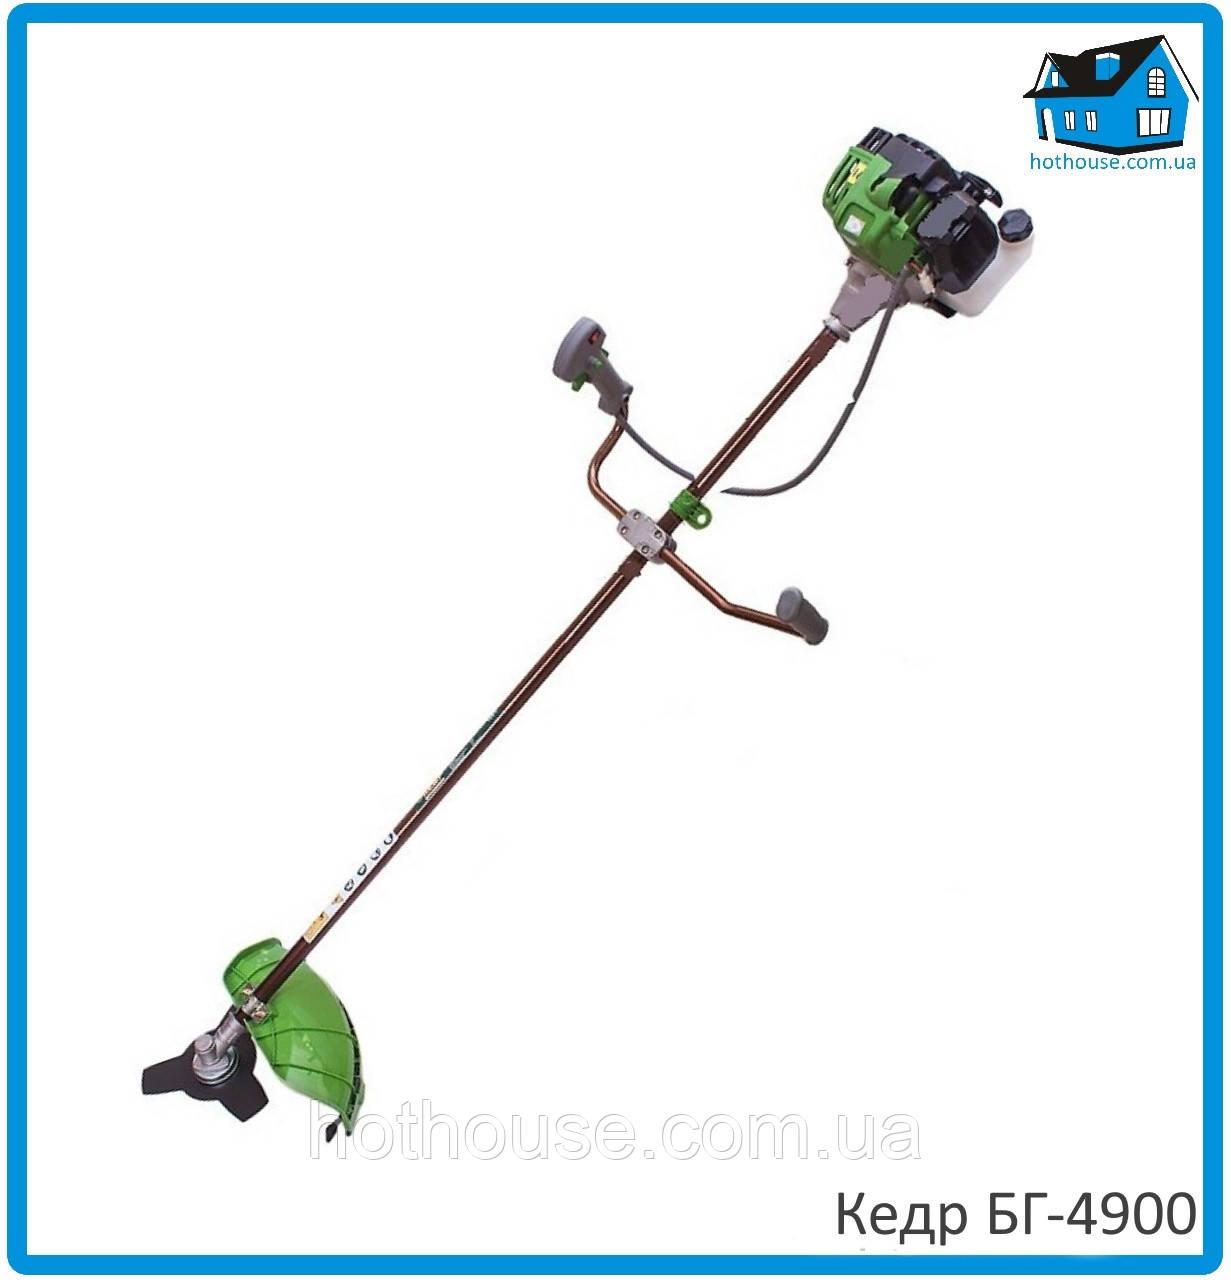 Коса бензиновая Кедр БГ-4900